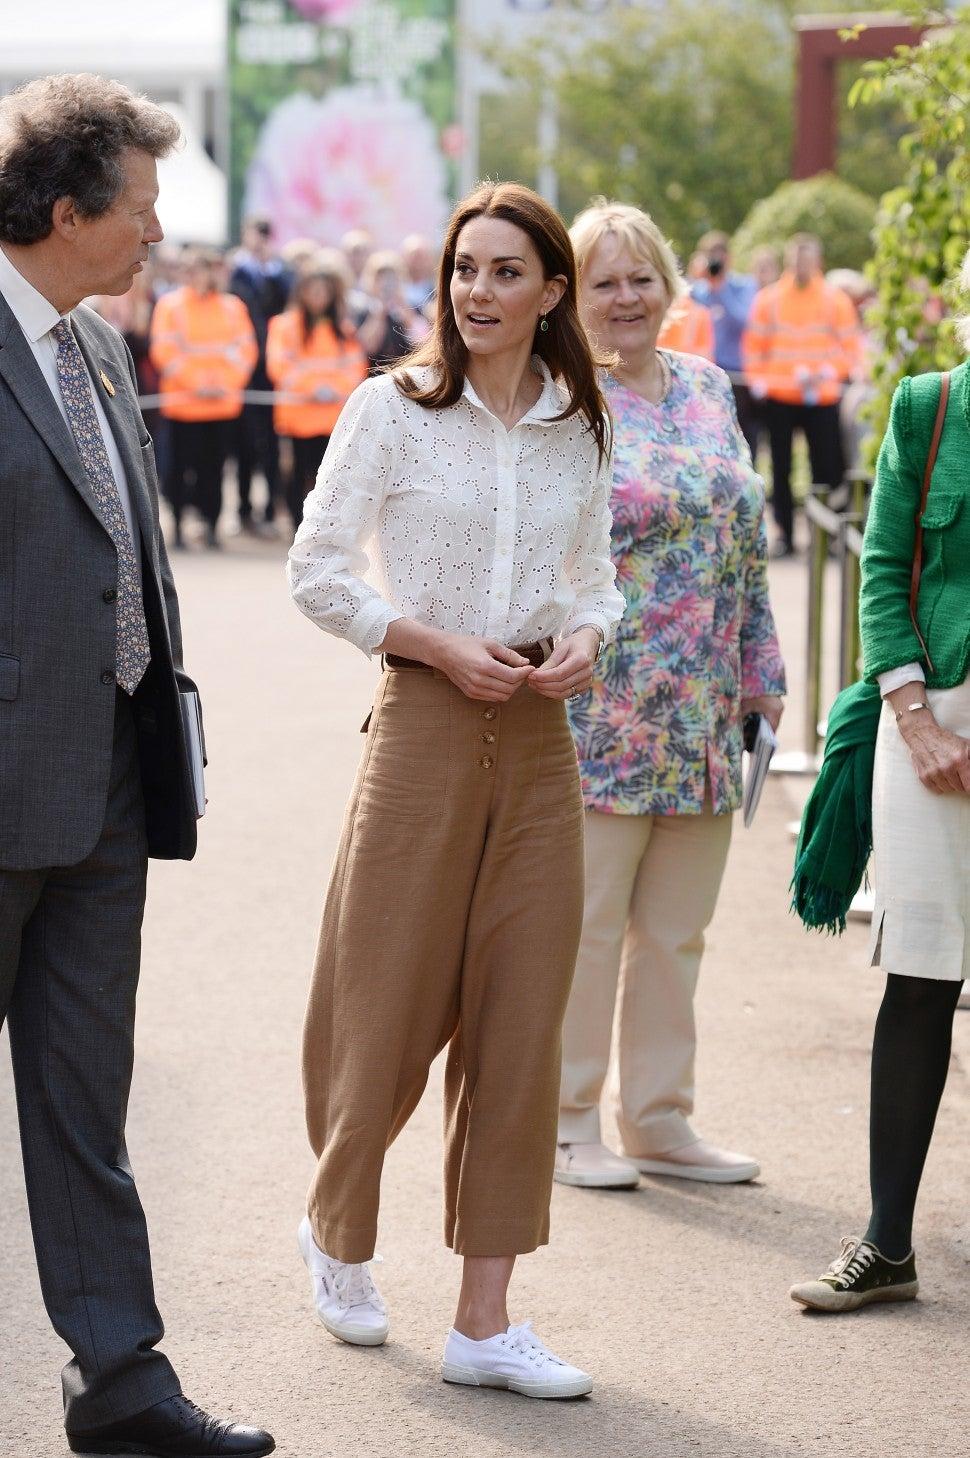 Kate Middleton's Superga Sneakers for